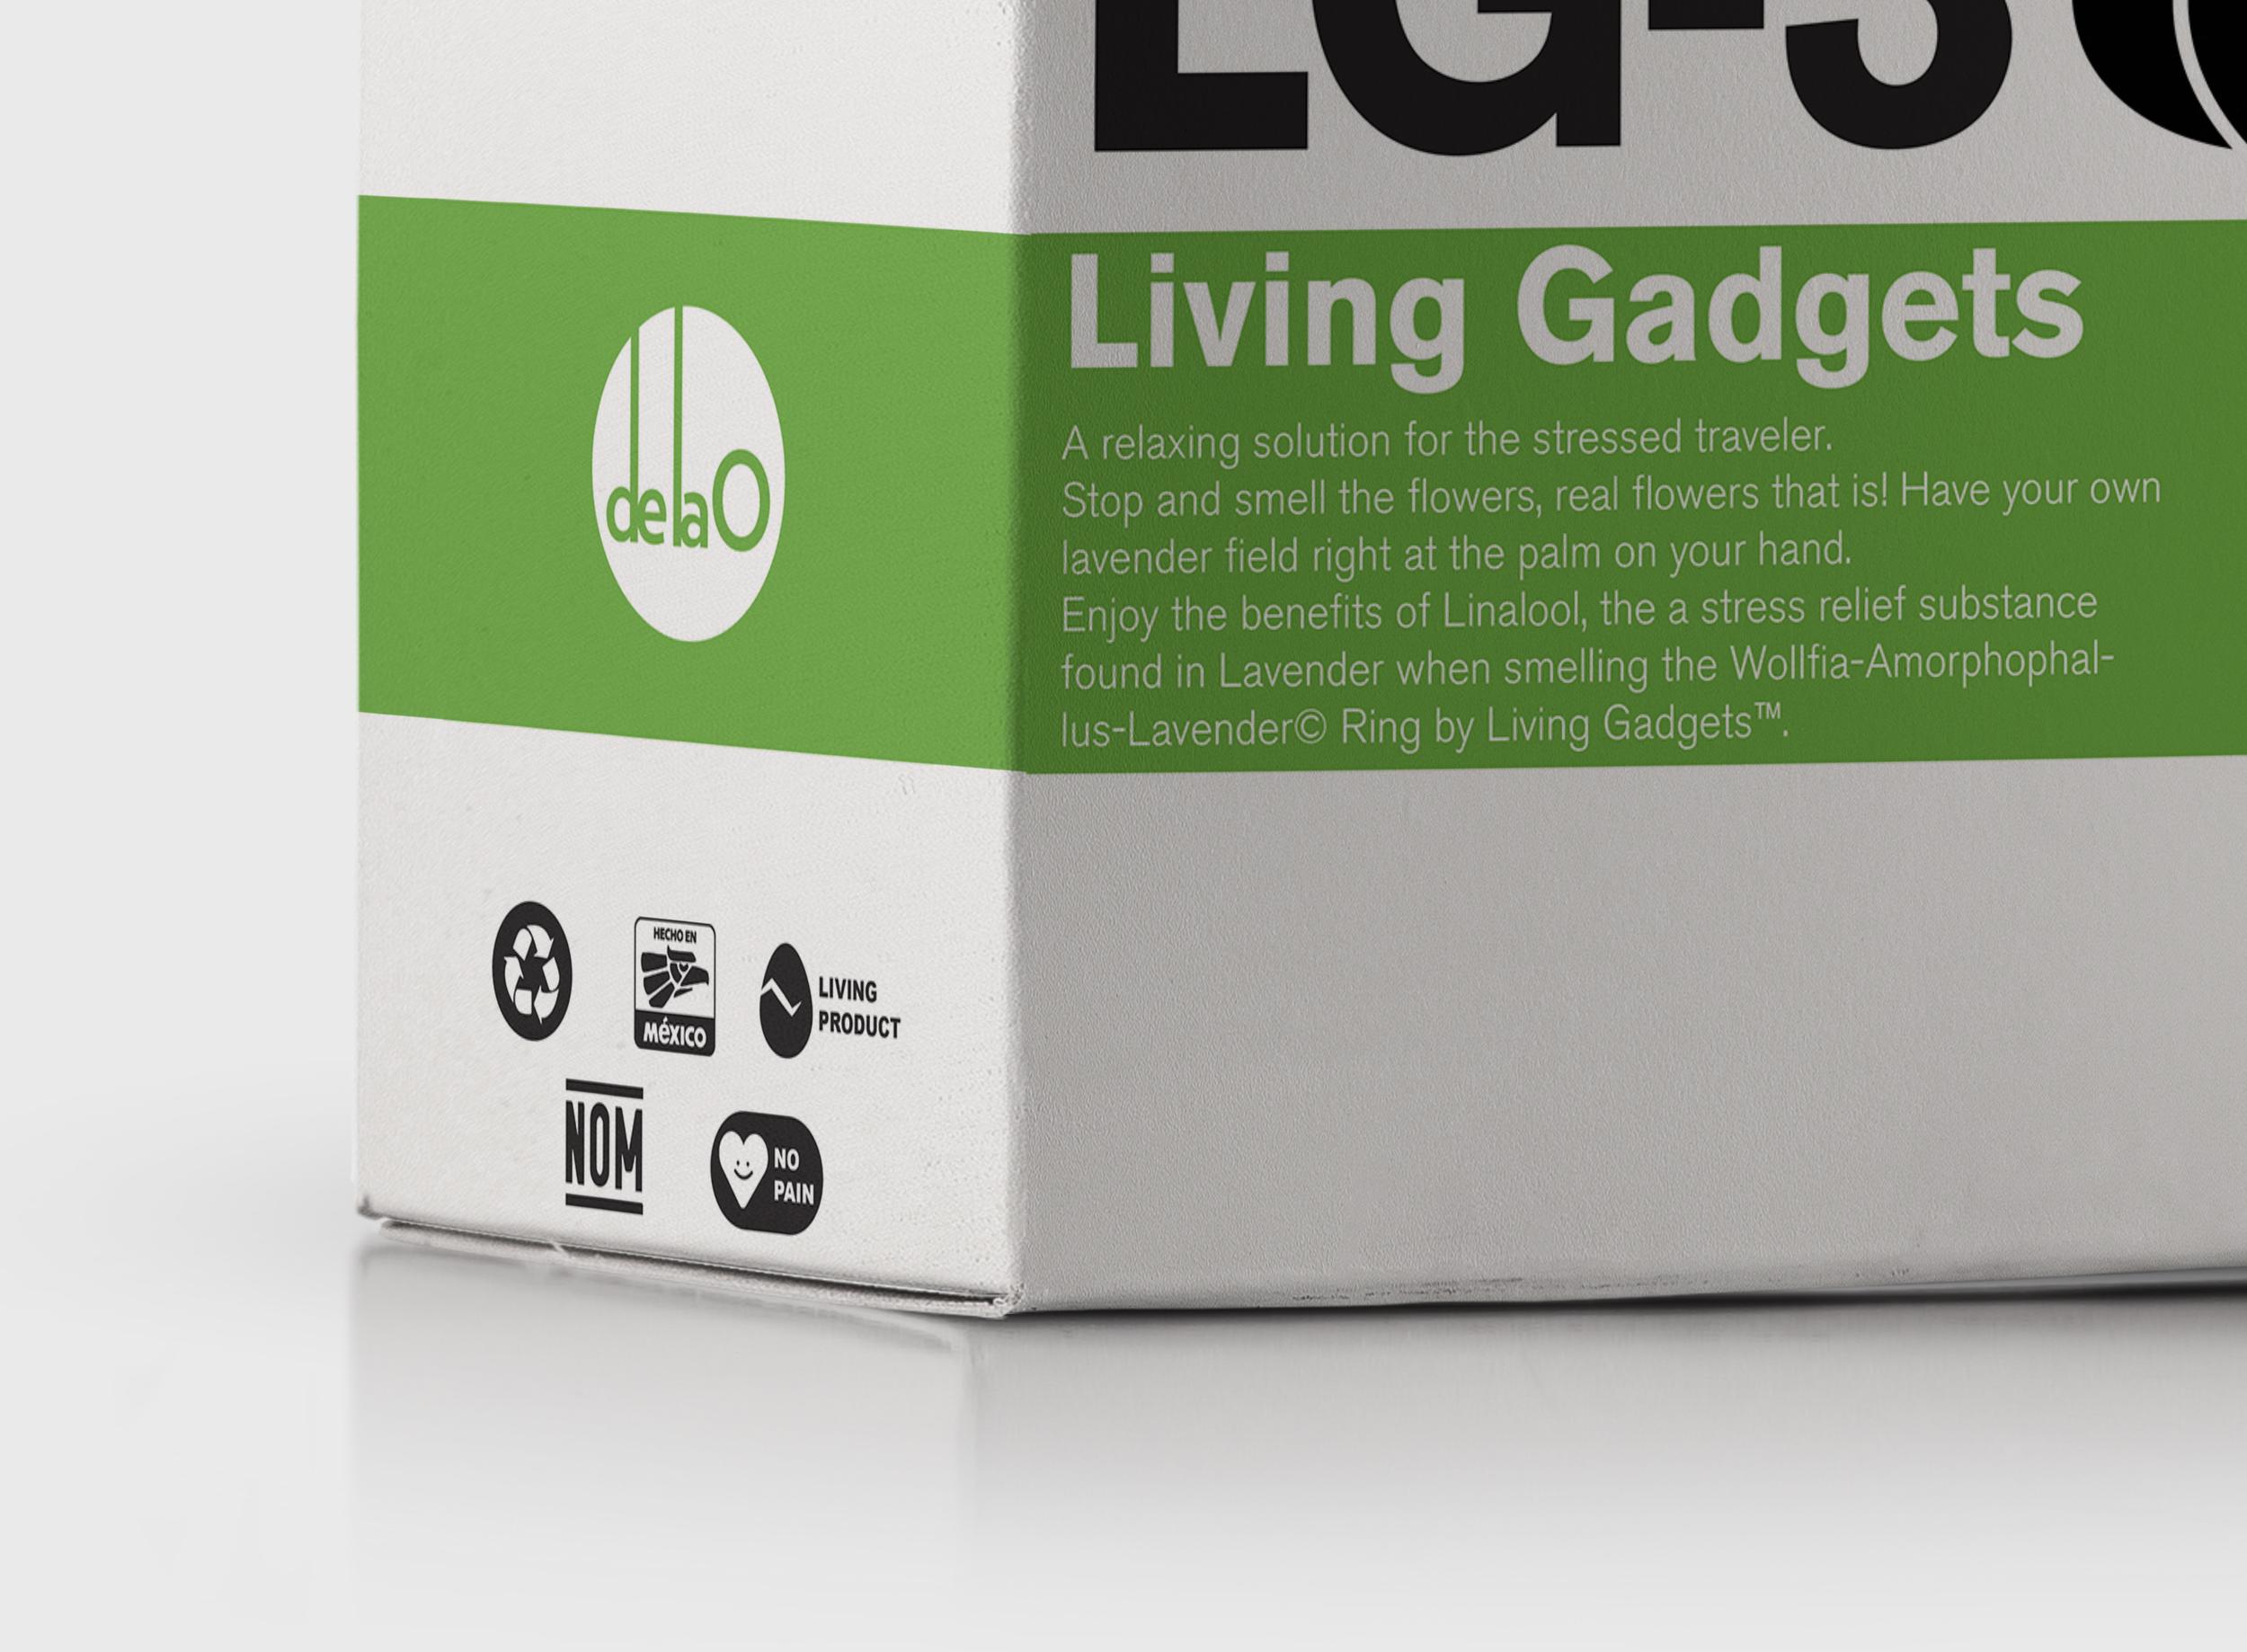 Empaque Detalle LG-3.jpg